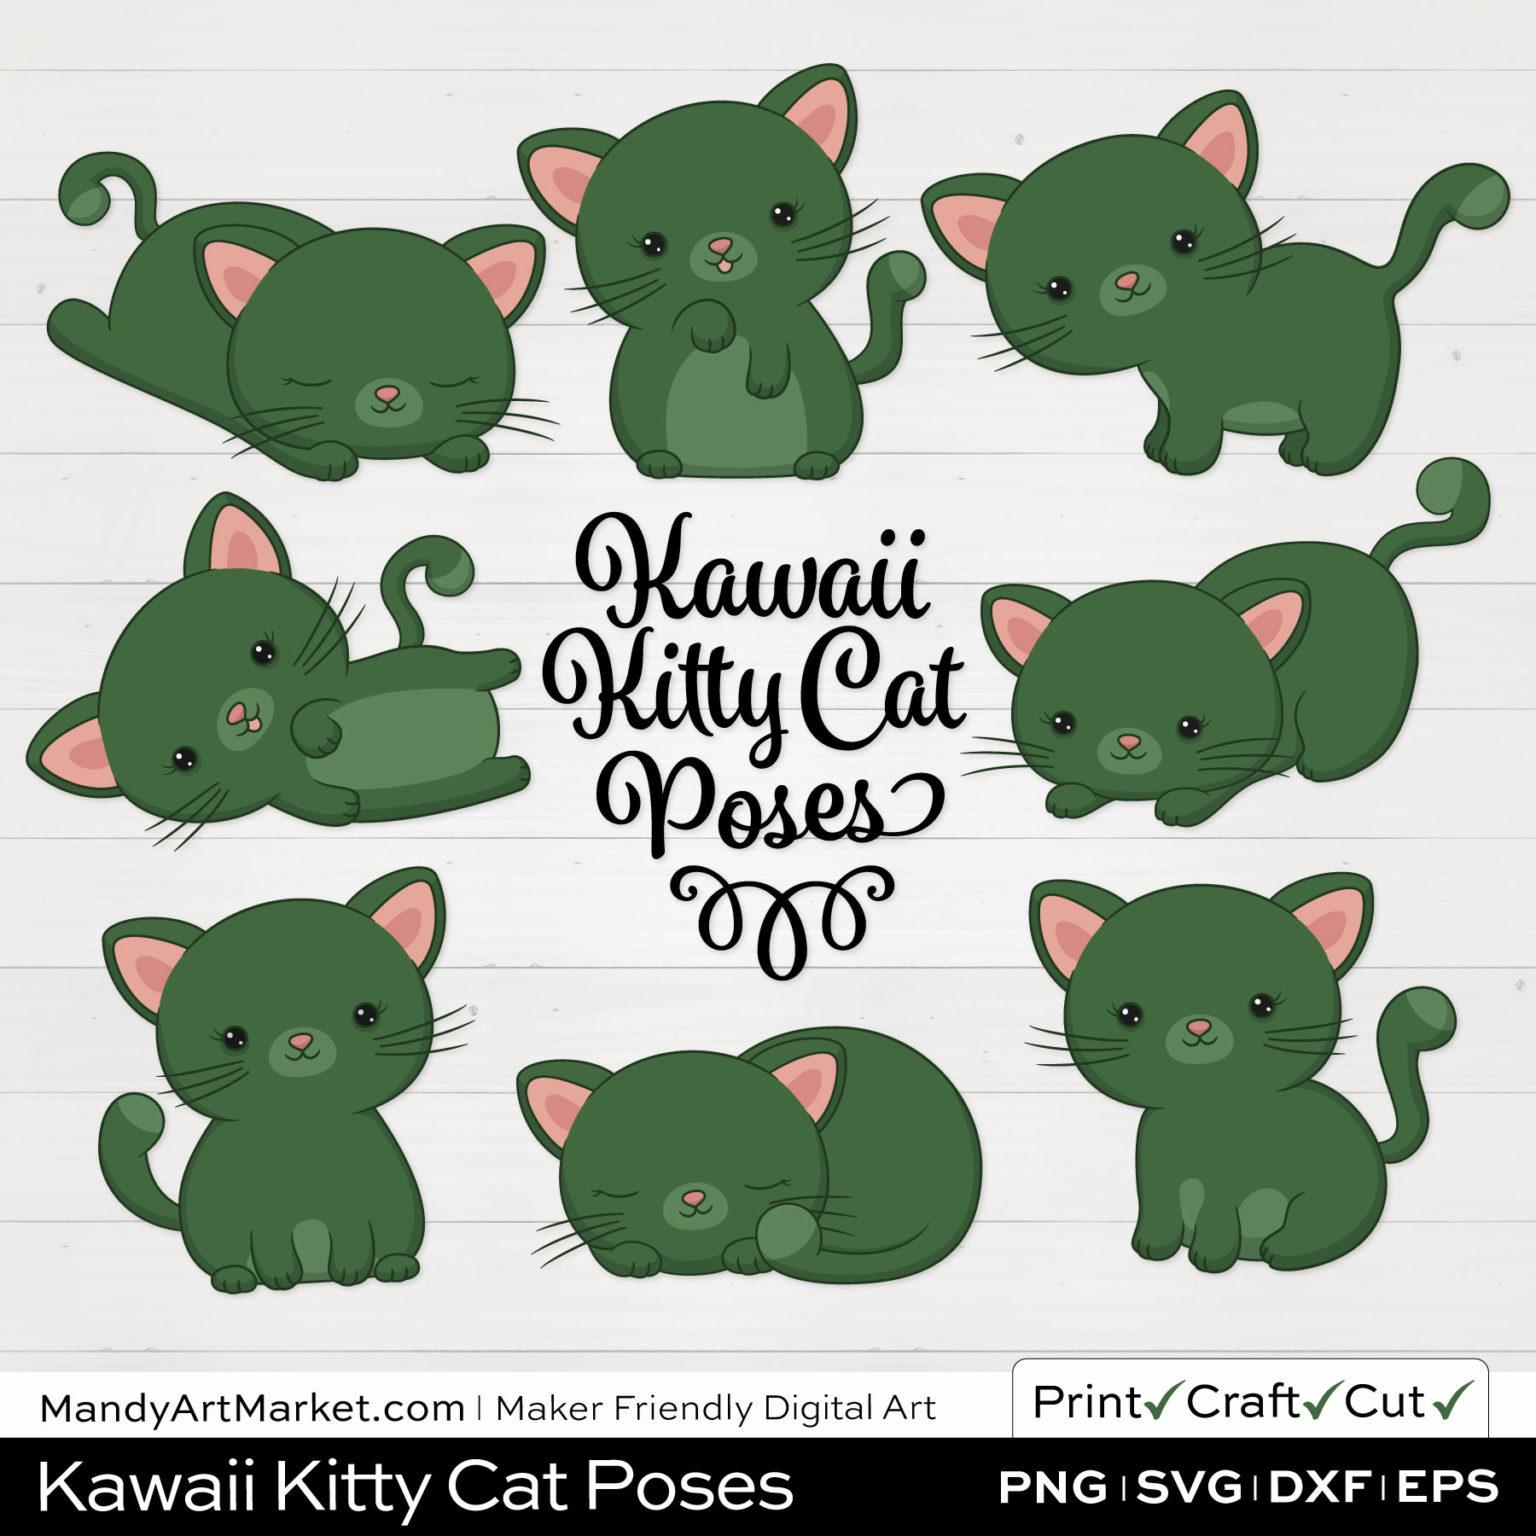 Hemlock Green Kawaii Kitty Cat Poses Clipart on White Background